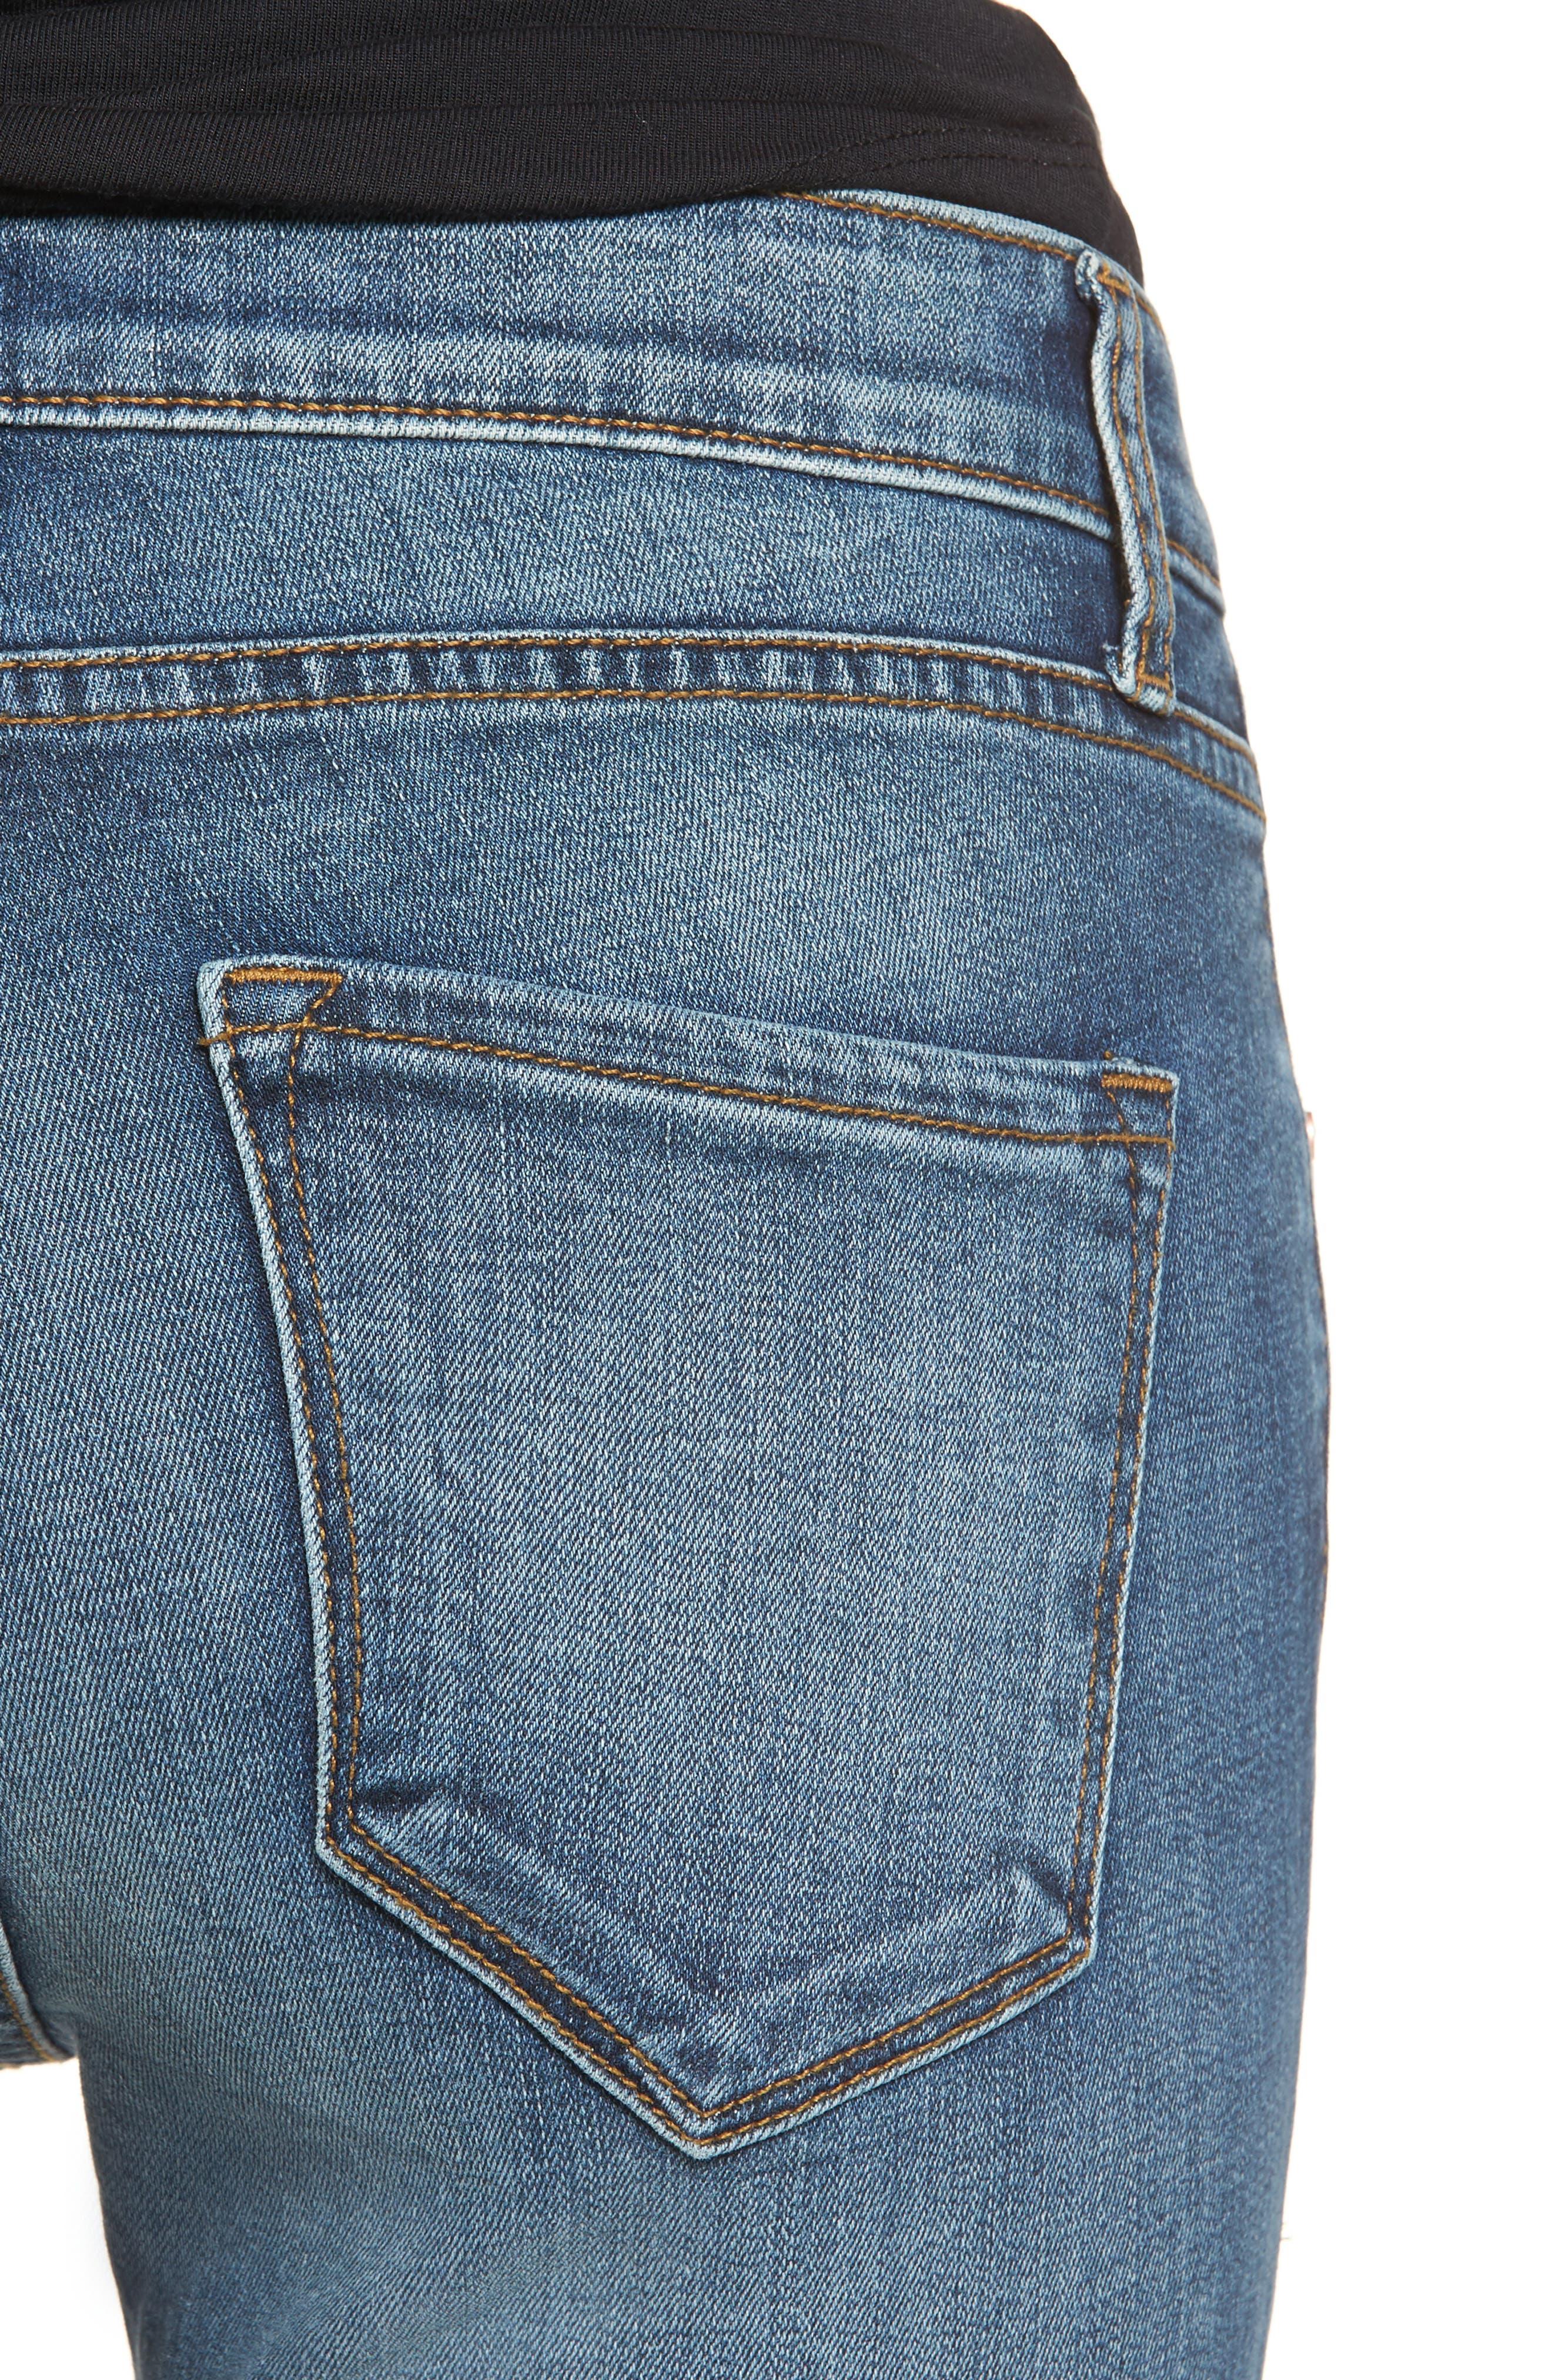 Decon Distressed Skinny Jeans,                             Alternate thumbnail 4, color,                             Vintage